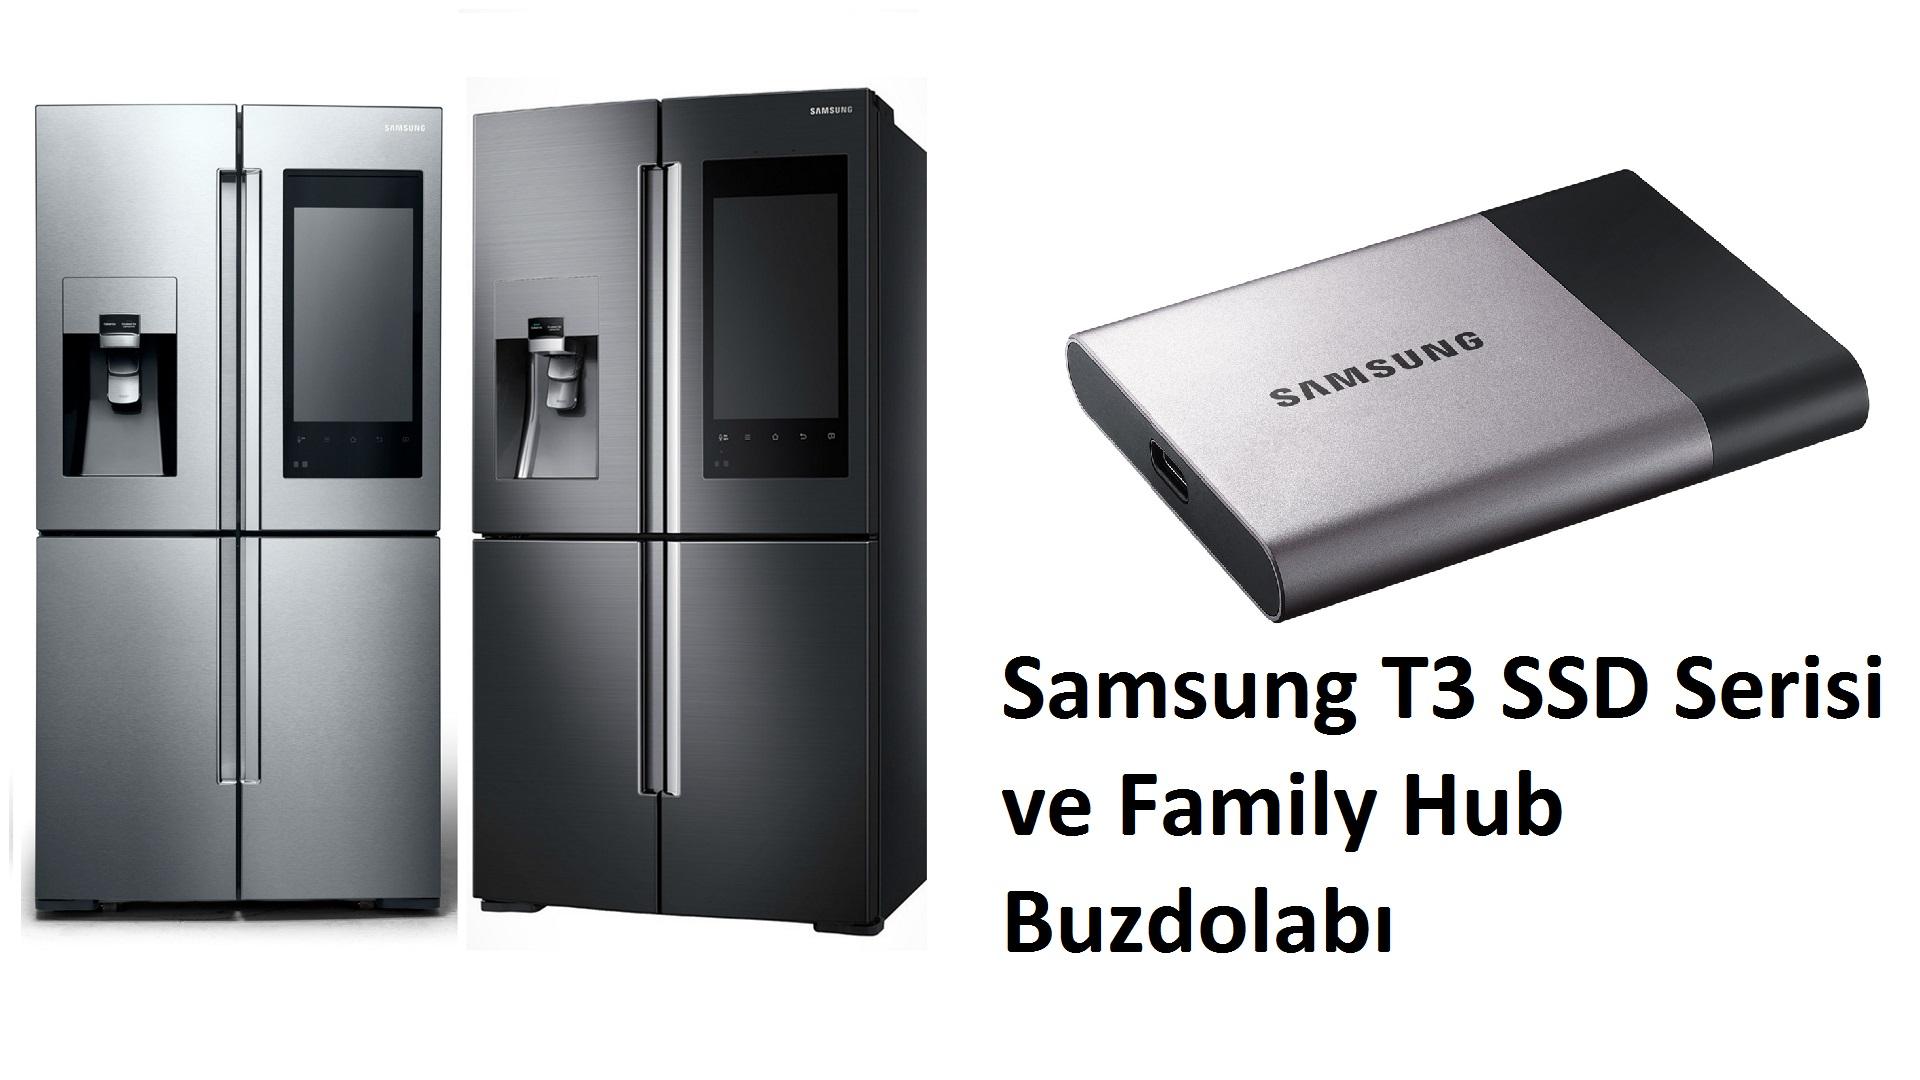 Samsung-Family-Hub-fridges.jpg